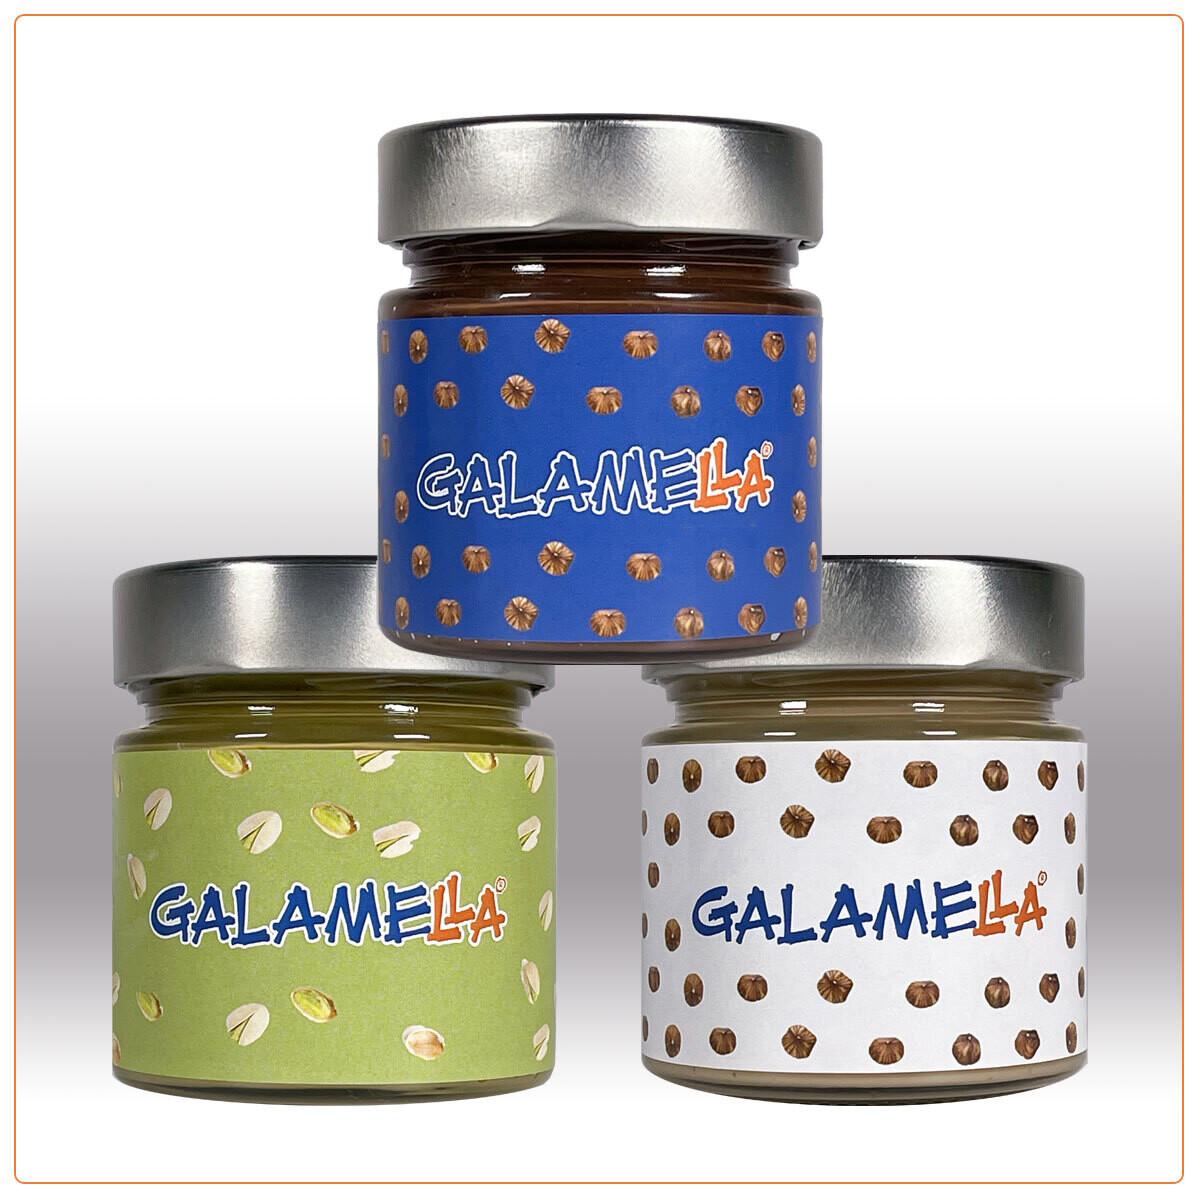 3 Creme spalmabili con olio extra vergine d'oliva: nocciola e cacao, bianca (senza cacao), pistacchio 230g